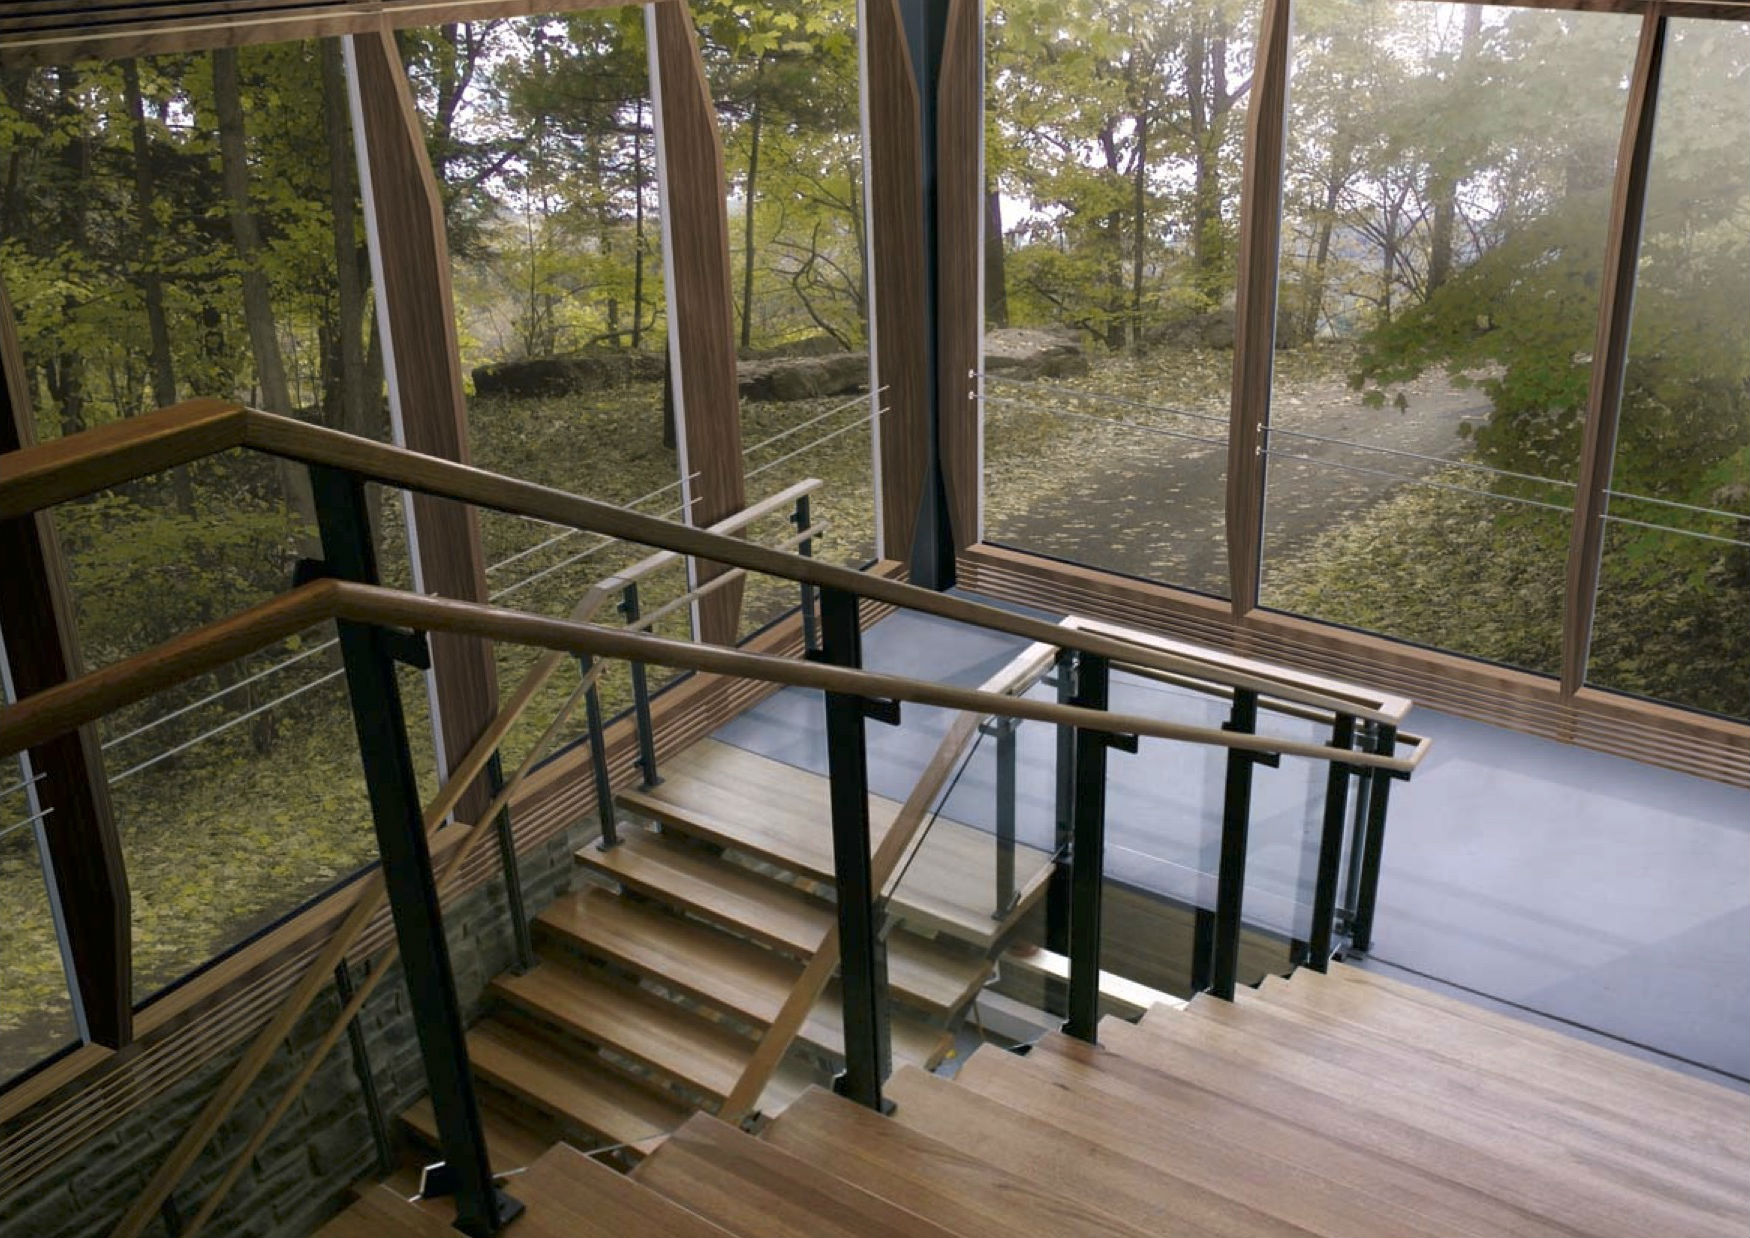 Wood-Aluminum Curtain Wall Systems